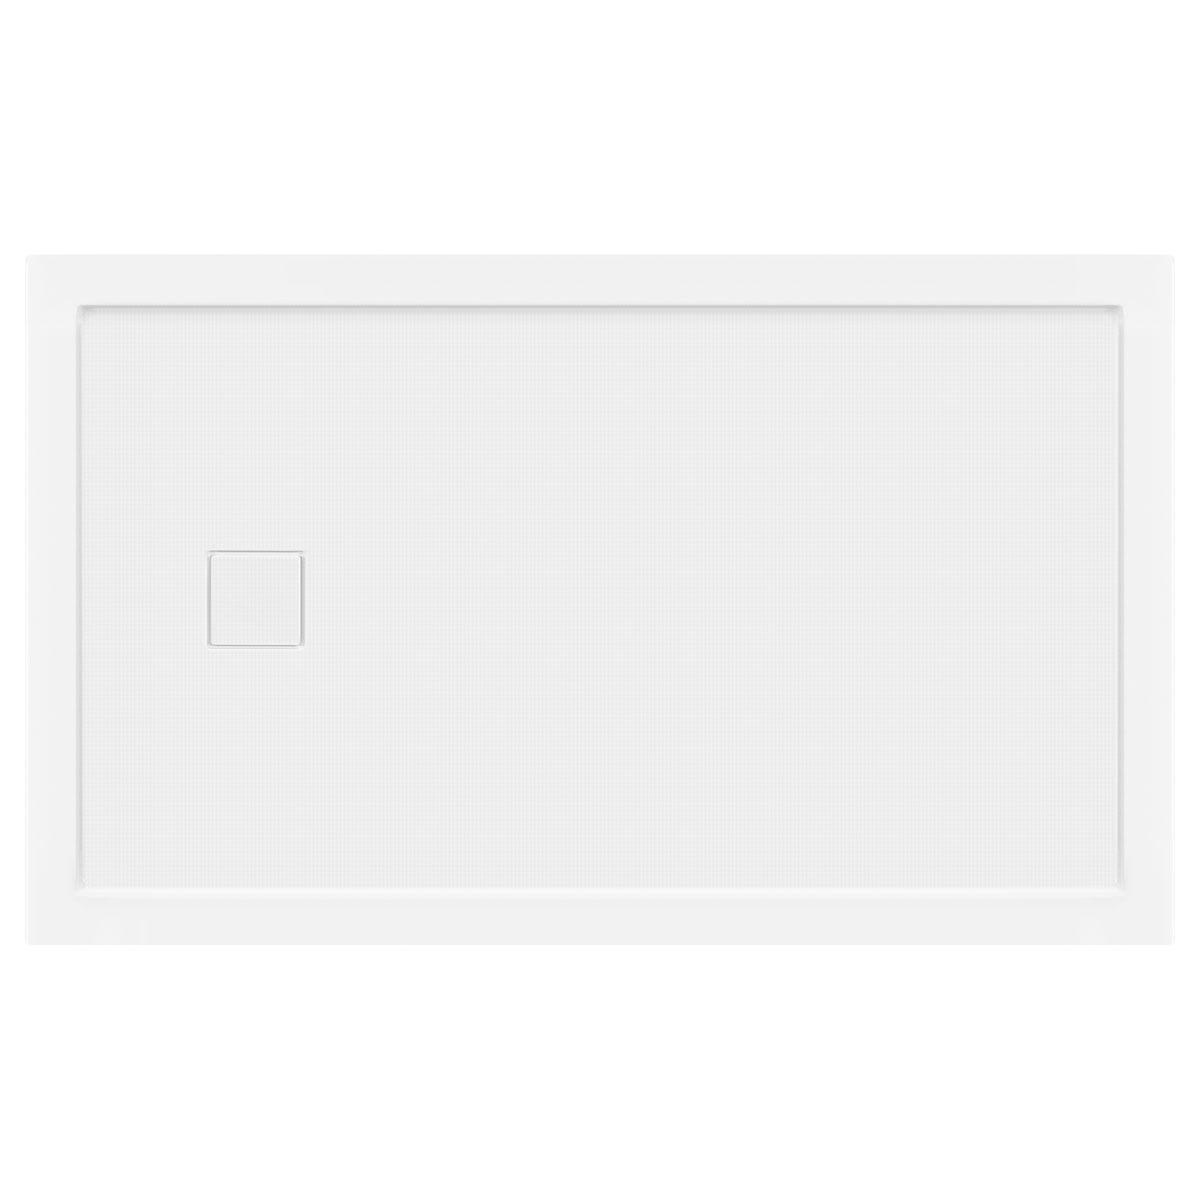 LessCare 60 x 36 Right Double Threshold Shower Pan Base Wall Corner Left Drain